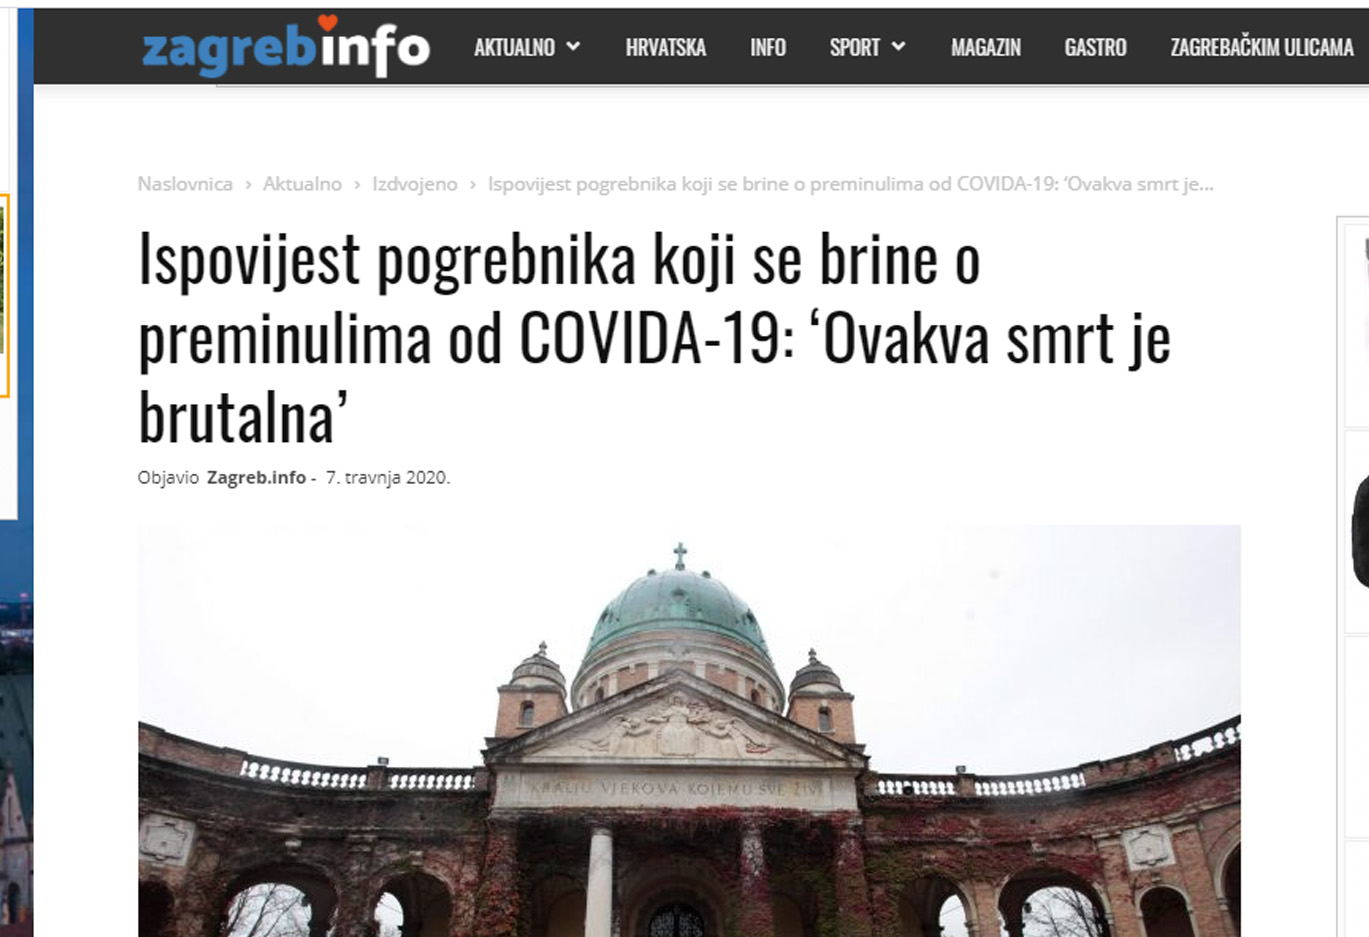 Pogrebnici - Zagrebinfo